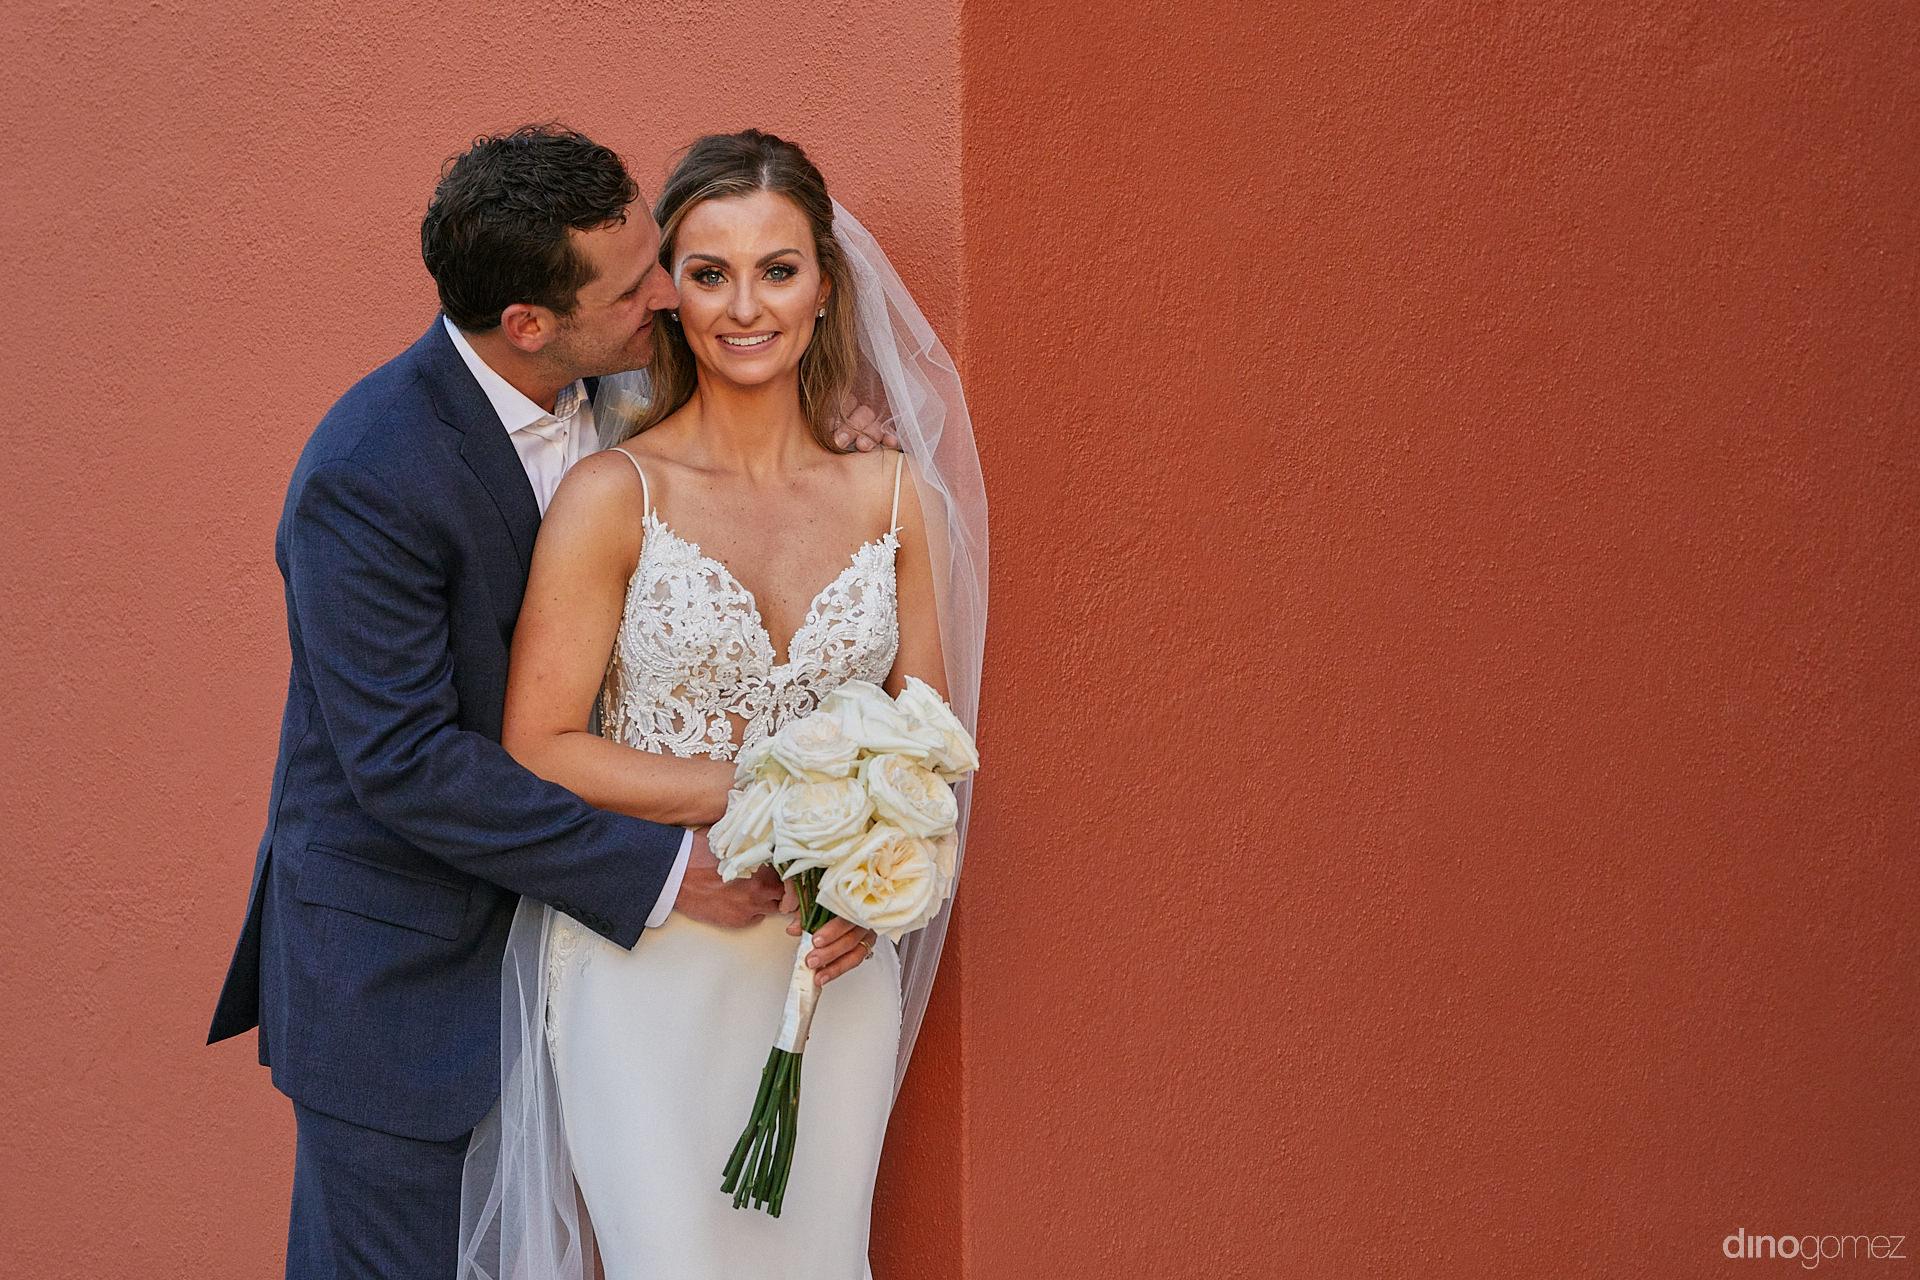 Professional Videographer San José Del Cabo - Luxury Wedding Photographer In Cabo Dino Gomez - C&T